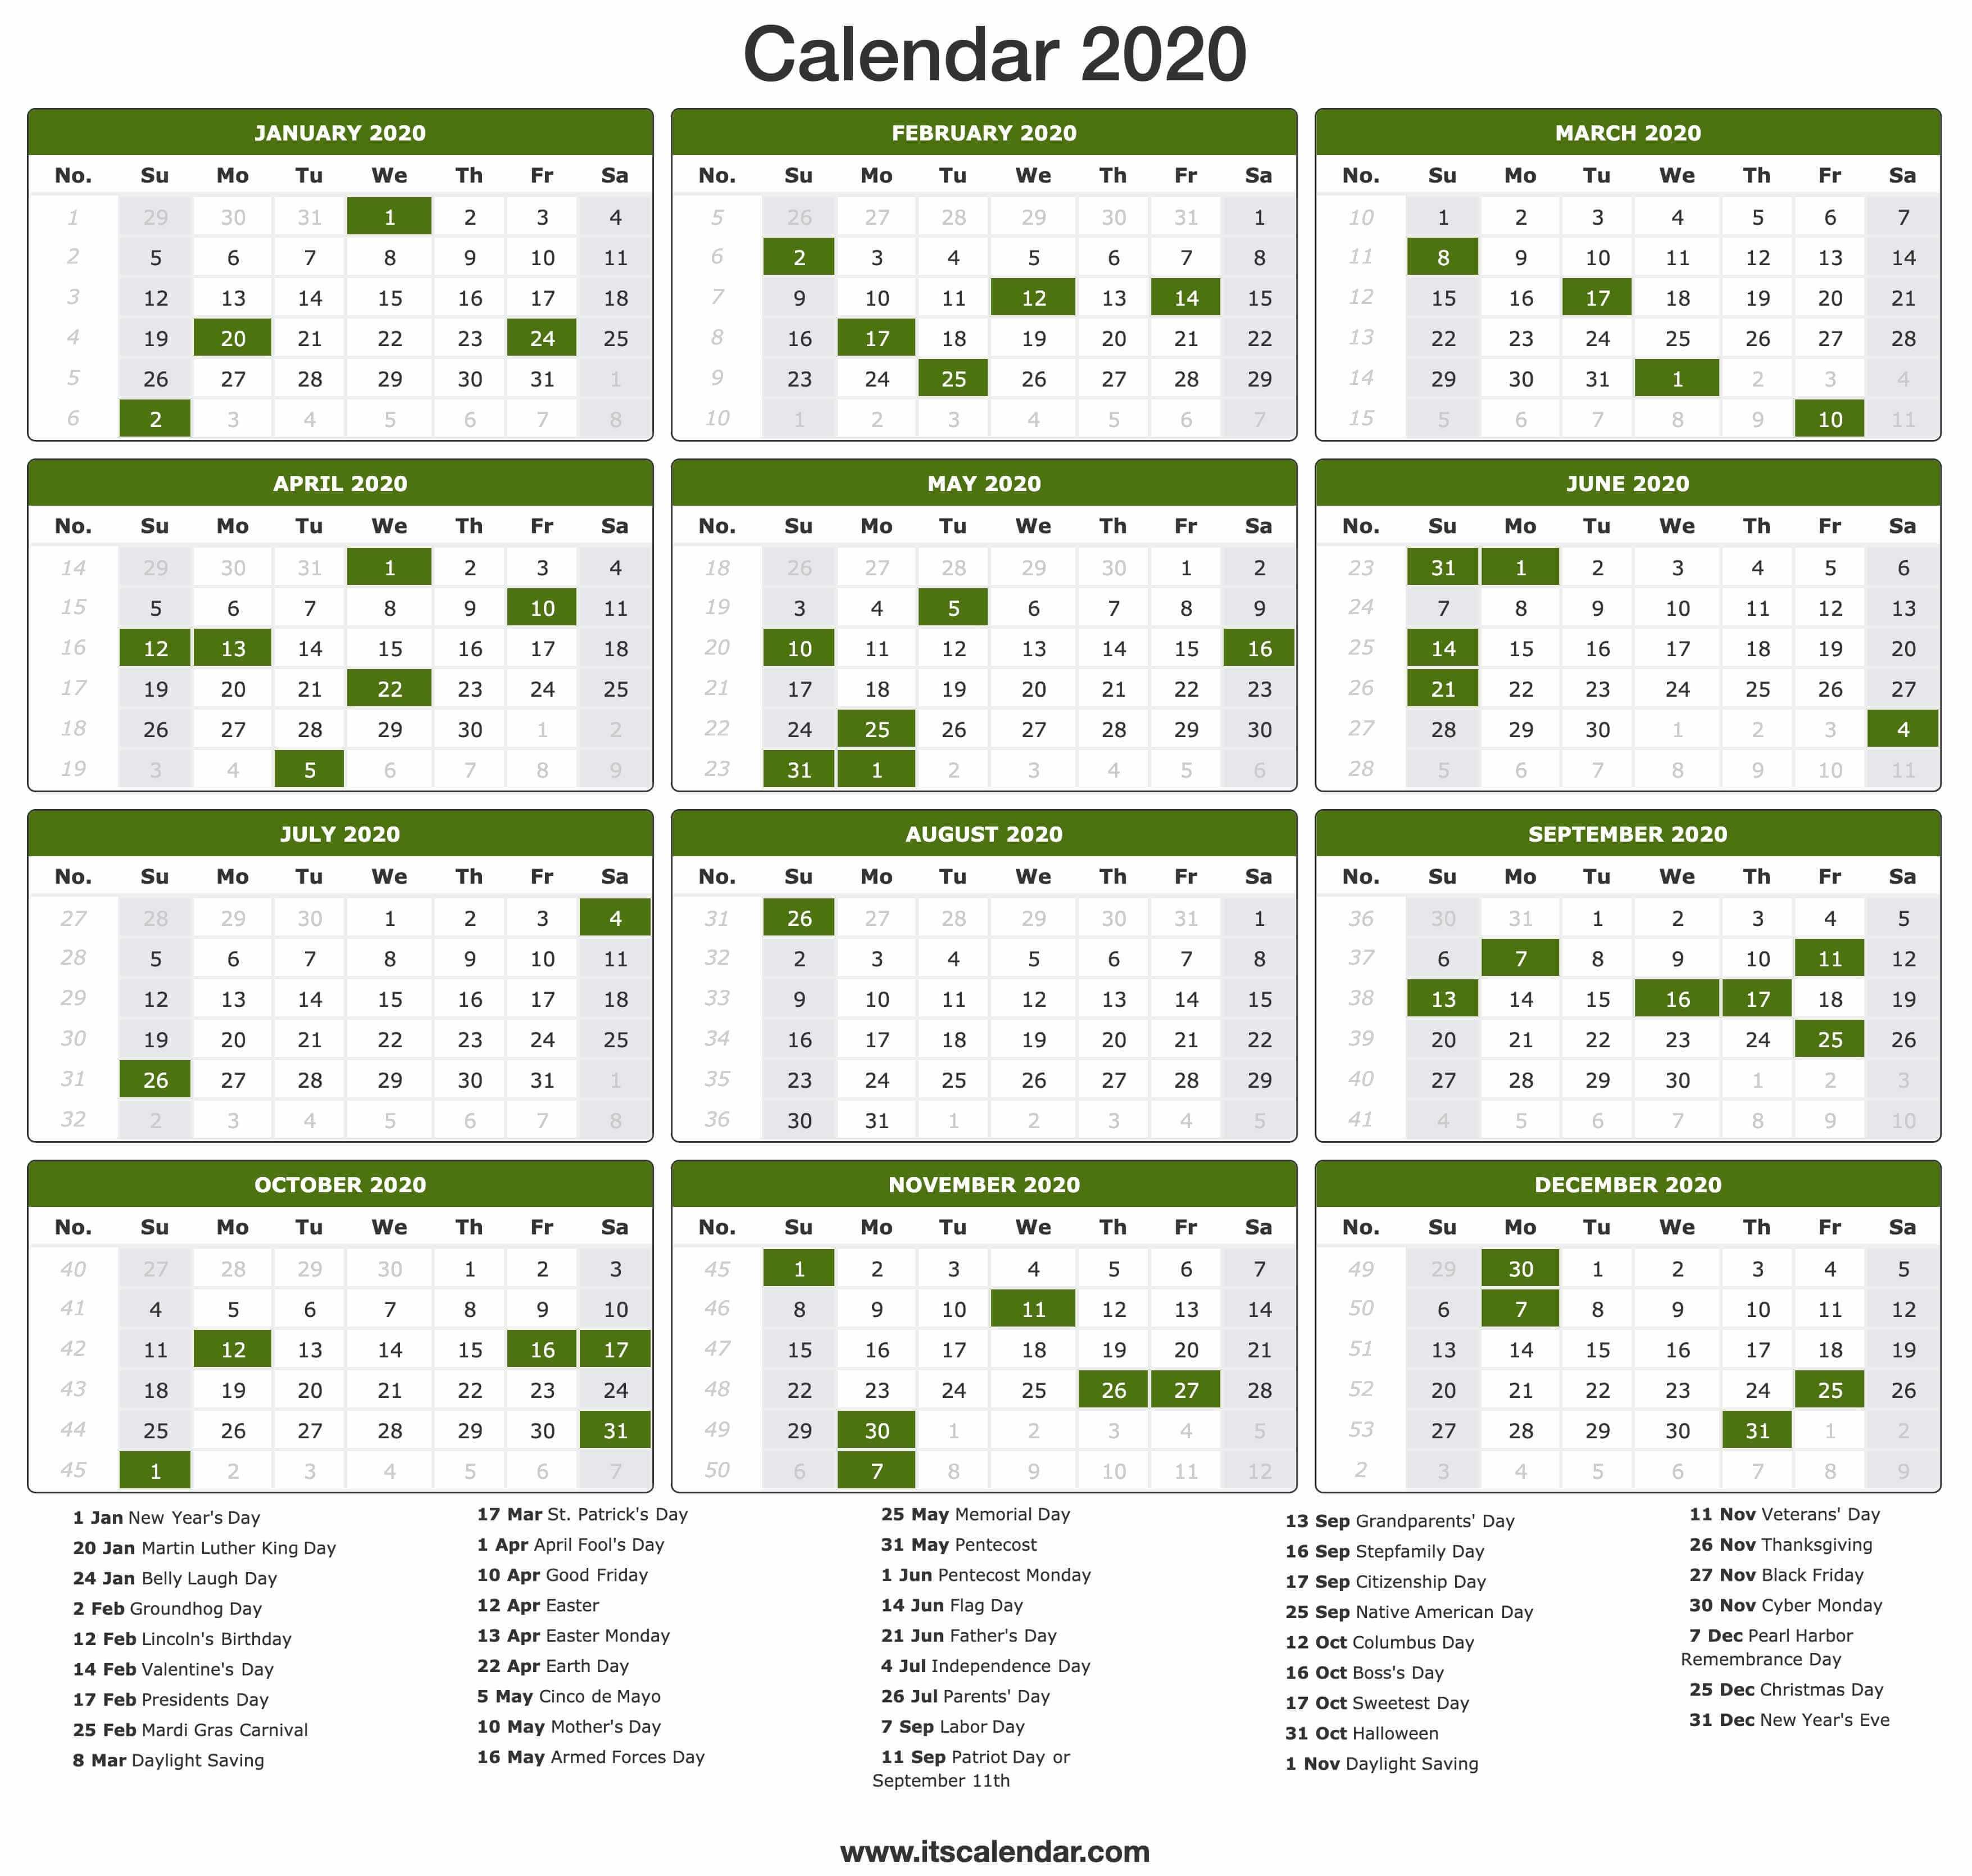 2020 Calendar | Printable 2020 Calendar pertaining to Calendar At A Glance With Usa Holidays For 2020